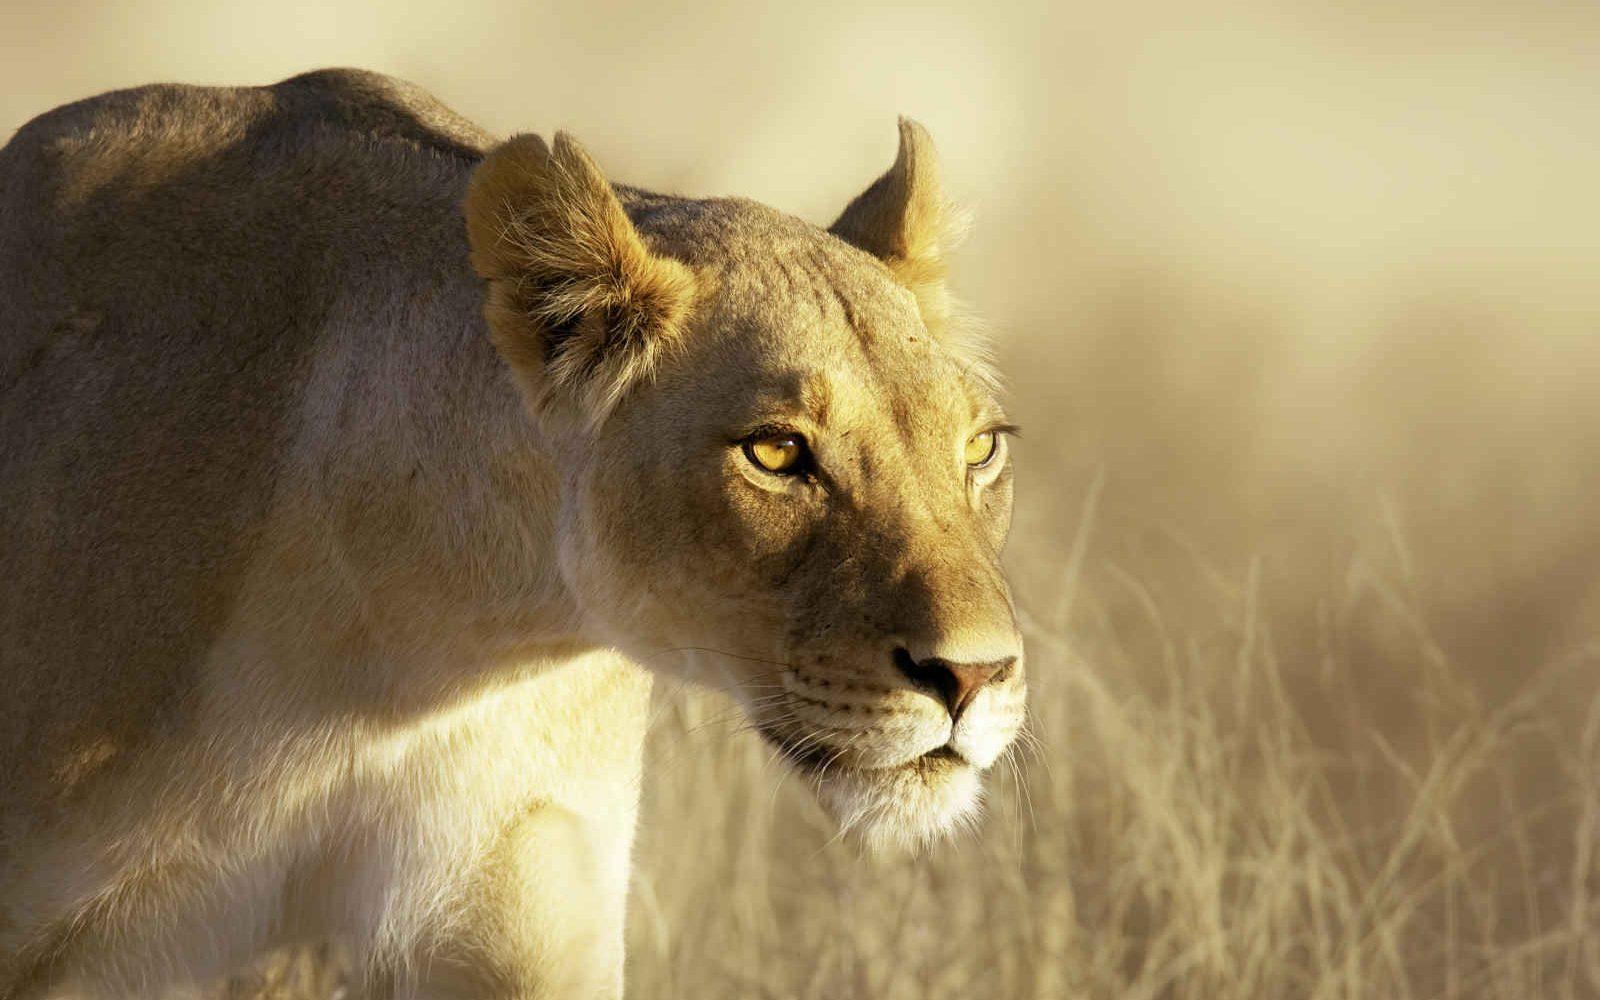 Lioness, Kalahari Gemsbok National Park, South Africa